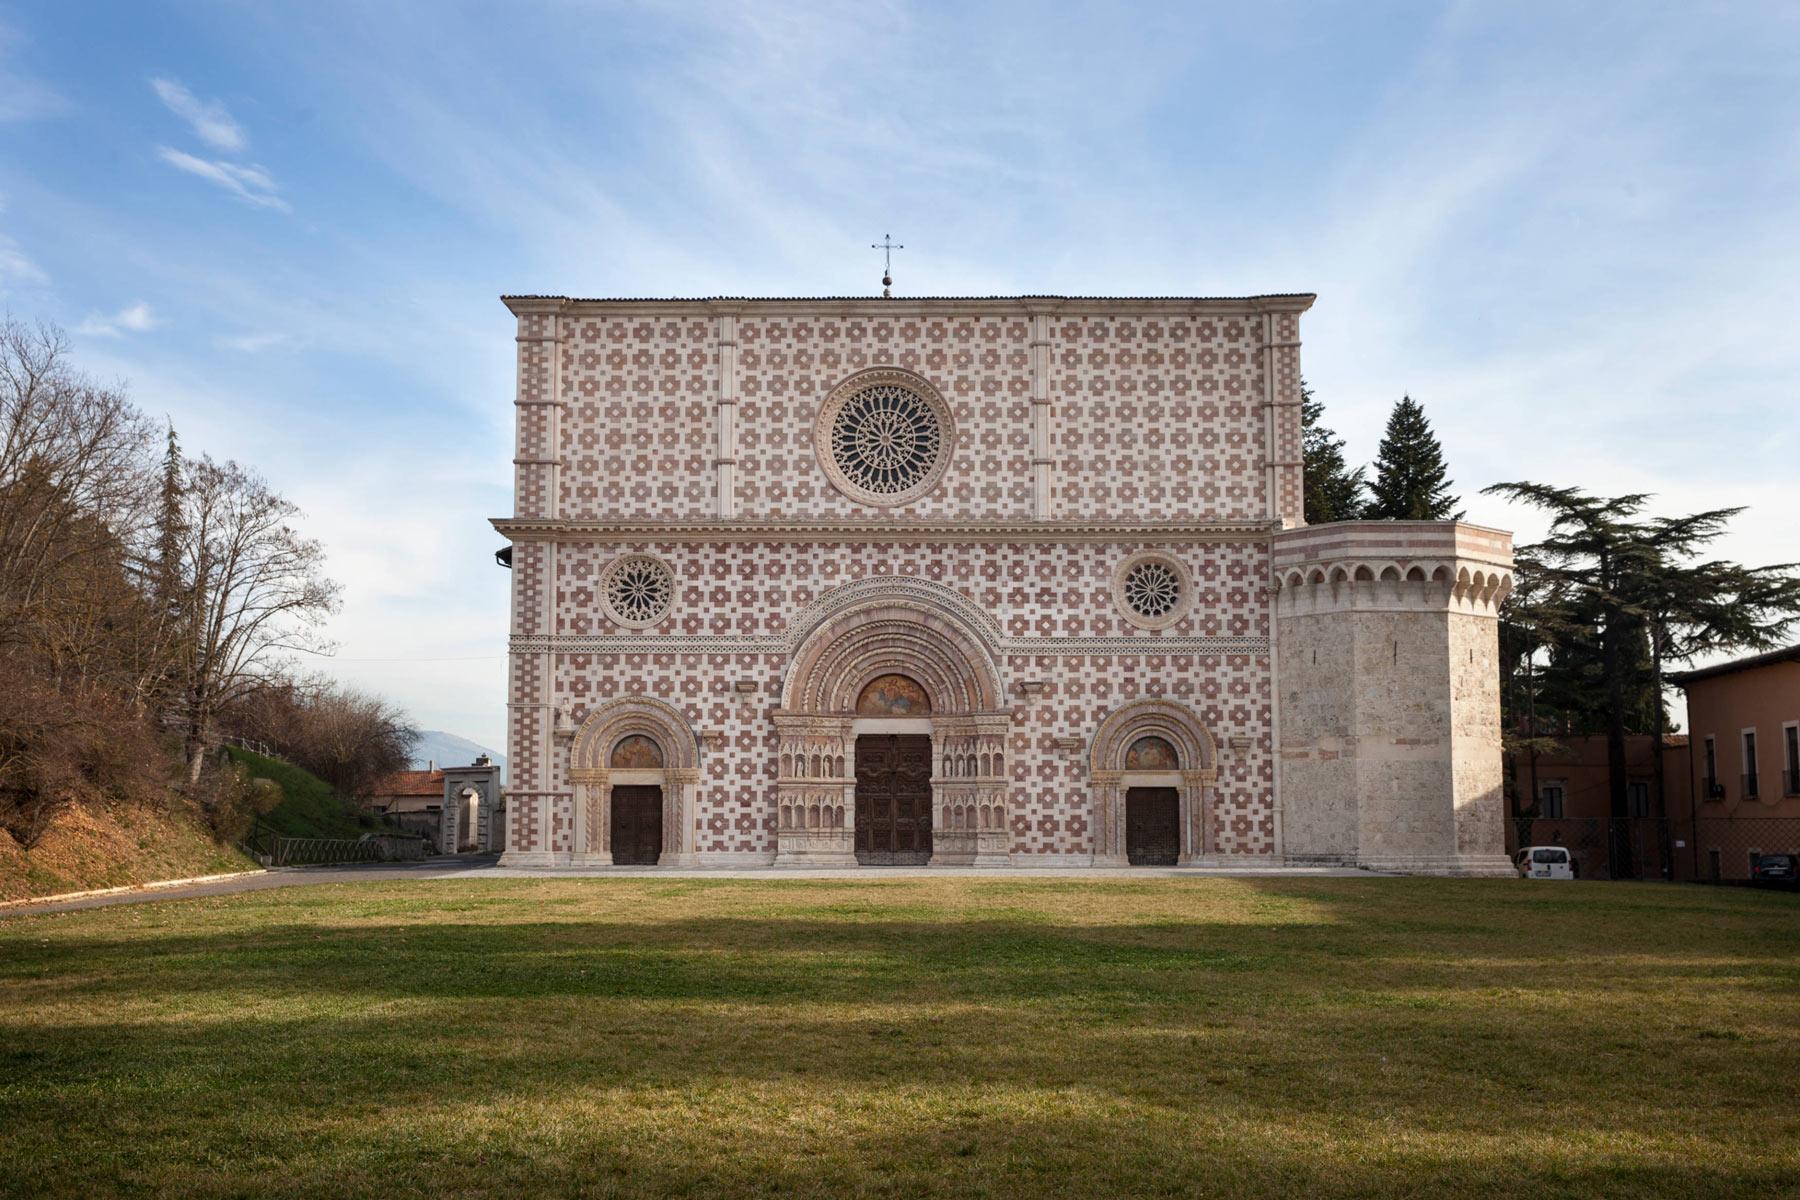 L'Aquila, candidata Capitale Italiana Cultura 2022, punta su cultura, arte e scienza